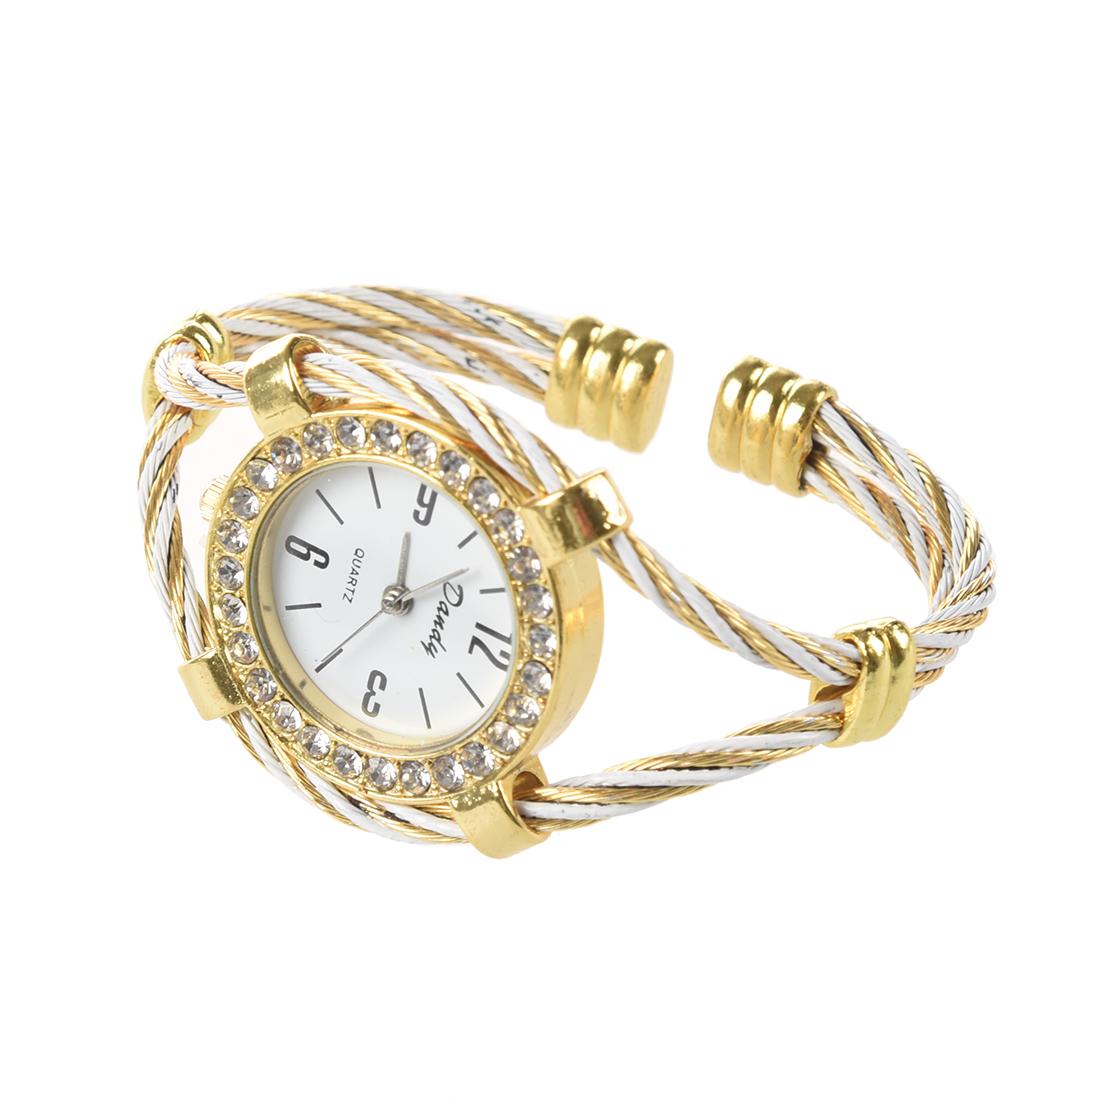 Gold Wrist Bracelet: Gold Tone Rope Lady Rhinestone Wrist Watch Bangle Bracelet